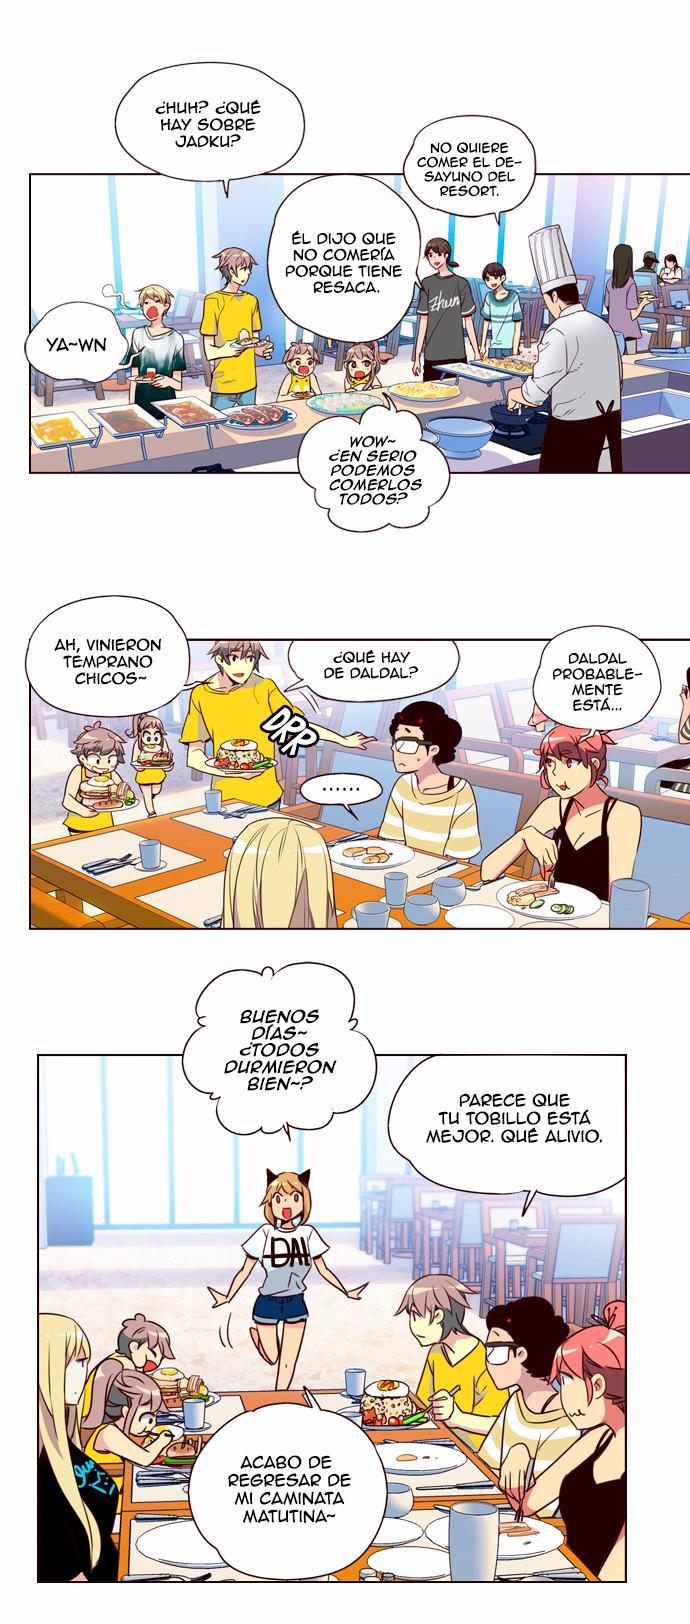 http://c5.ninemanga.com/es_manga/32/416/428940/bde1d613c4e7839d1baac6aea8357e7d.jpg Page 3